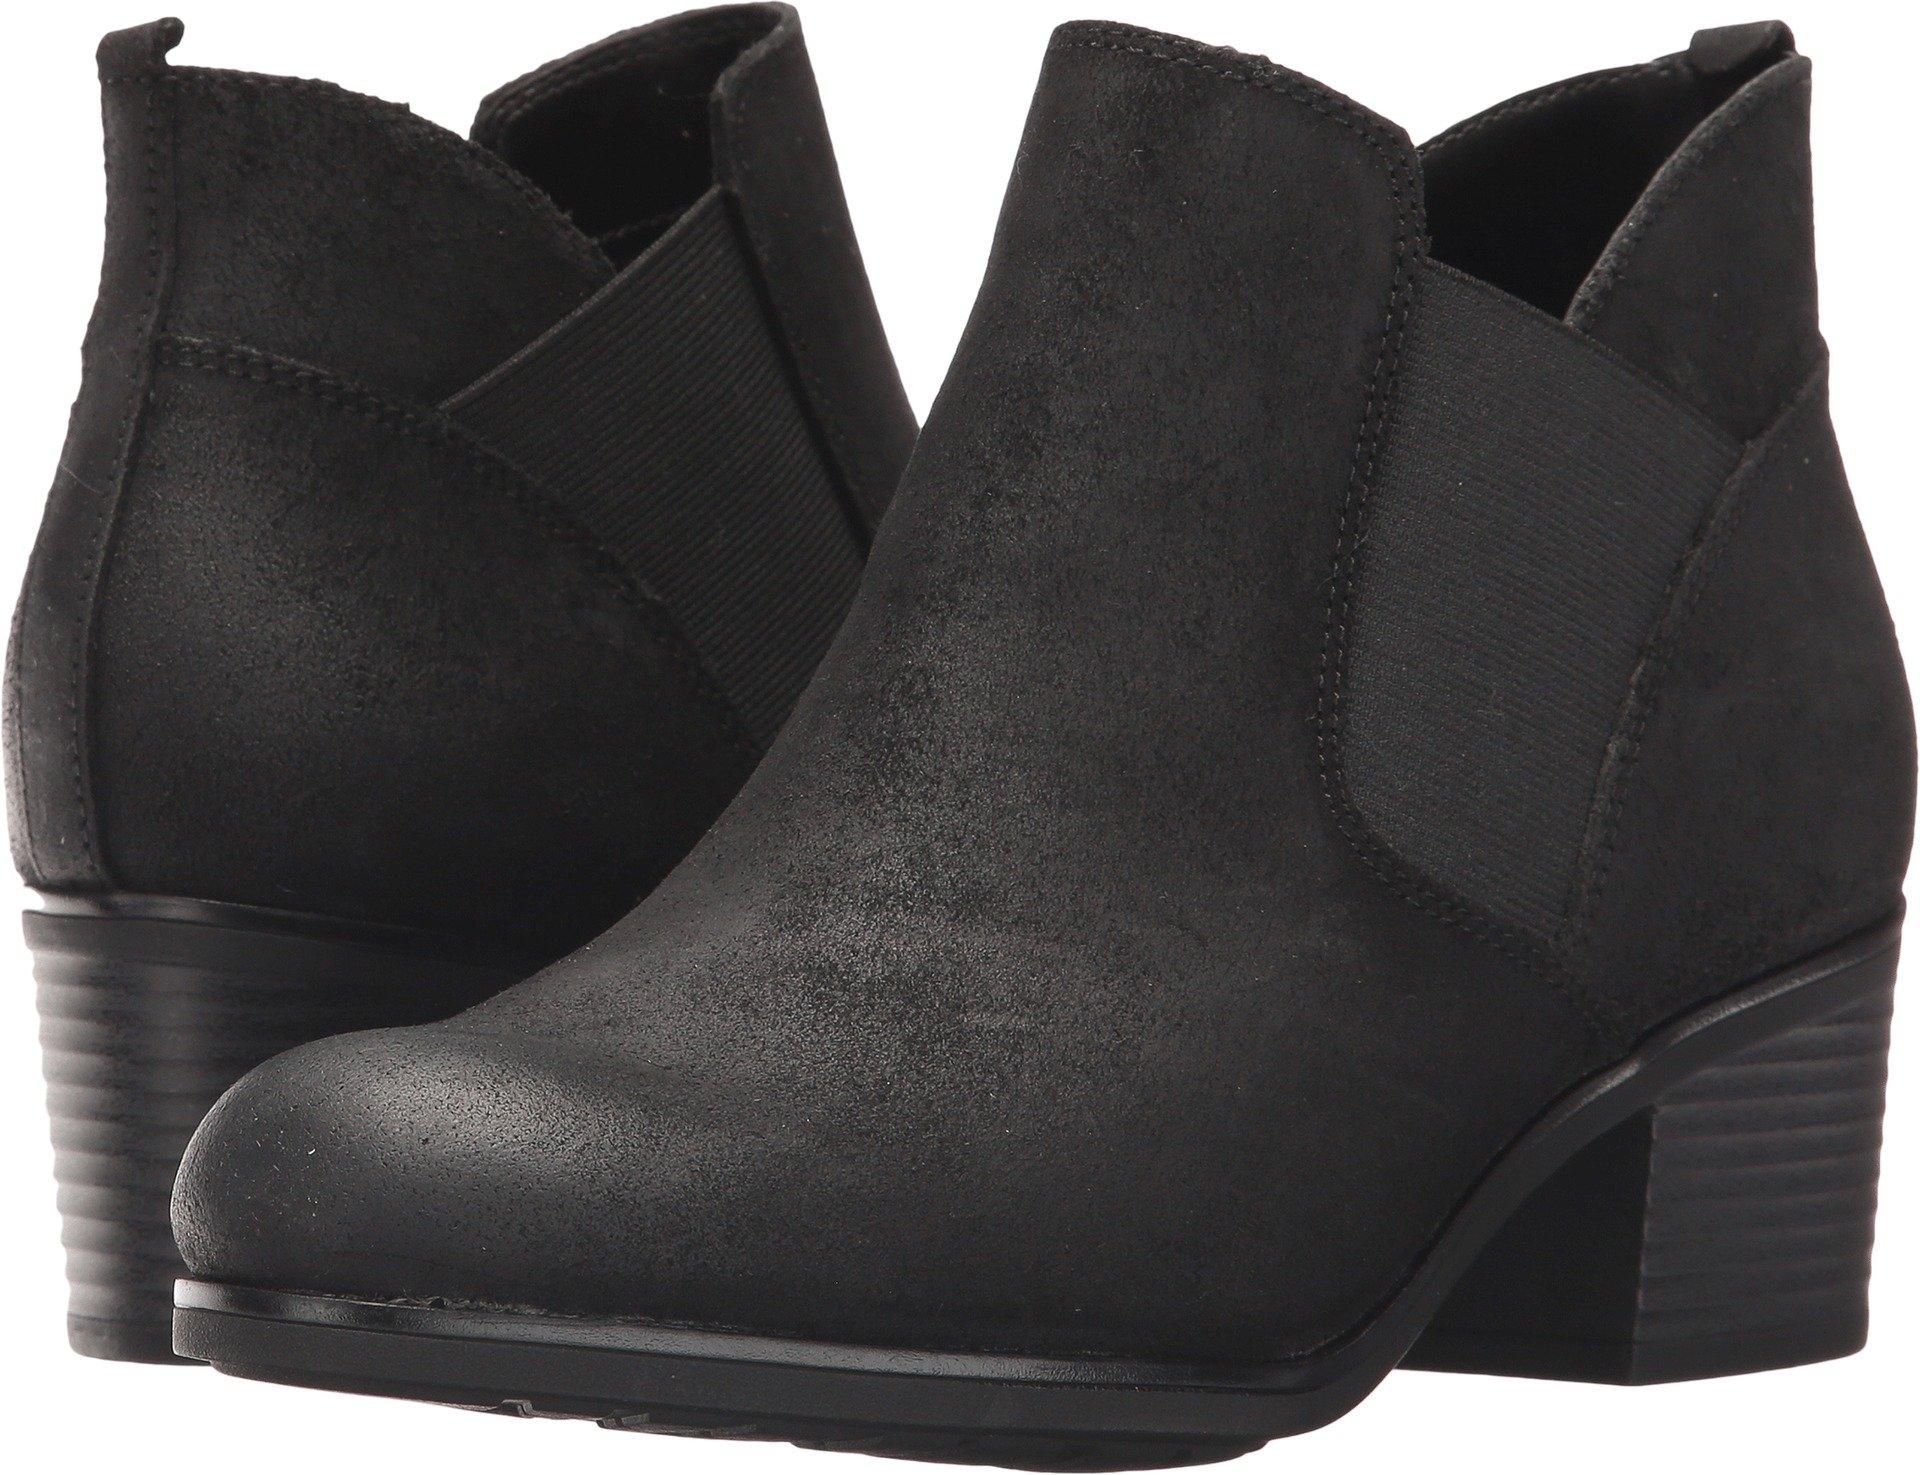 Rockport Women's Danii Chelsea Boot, Black Suede, 11 M US